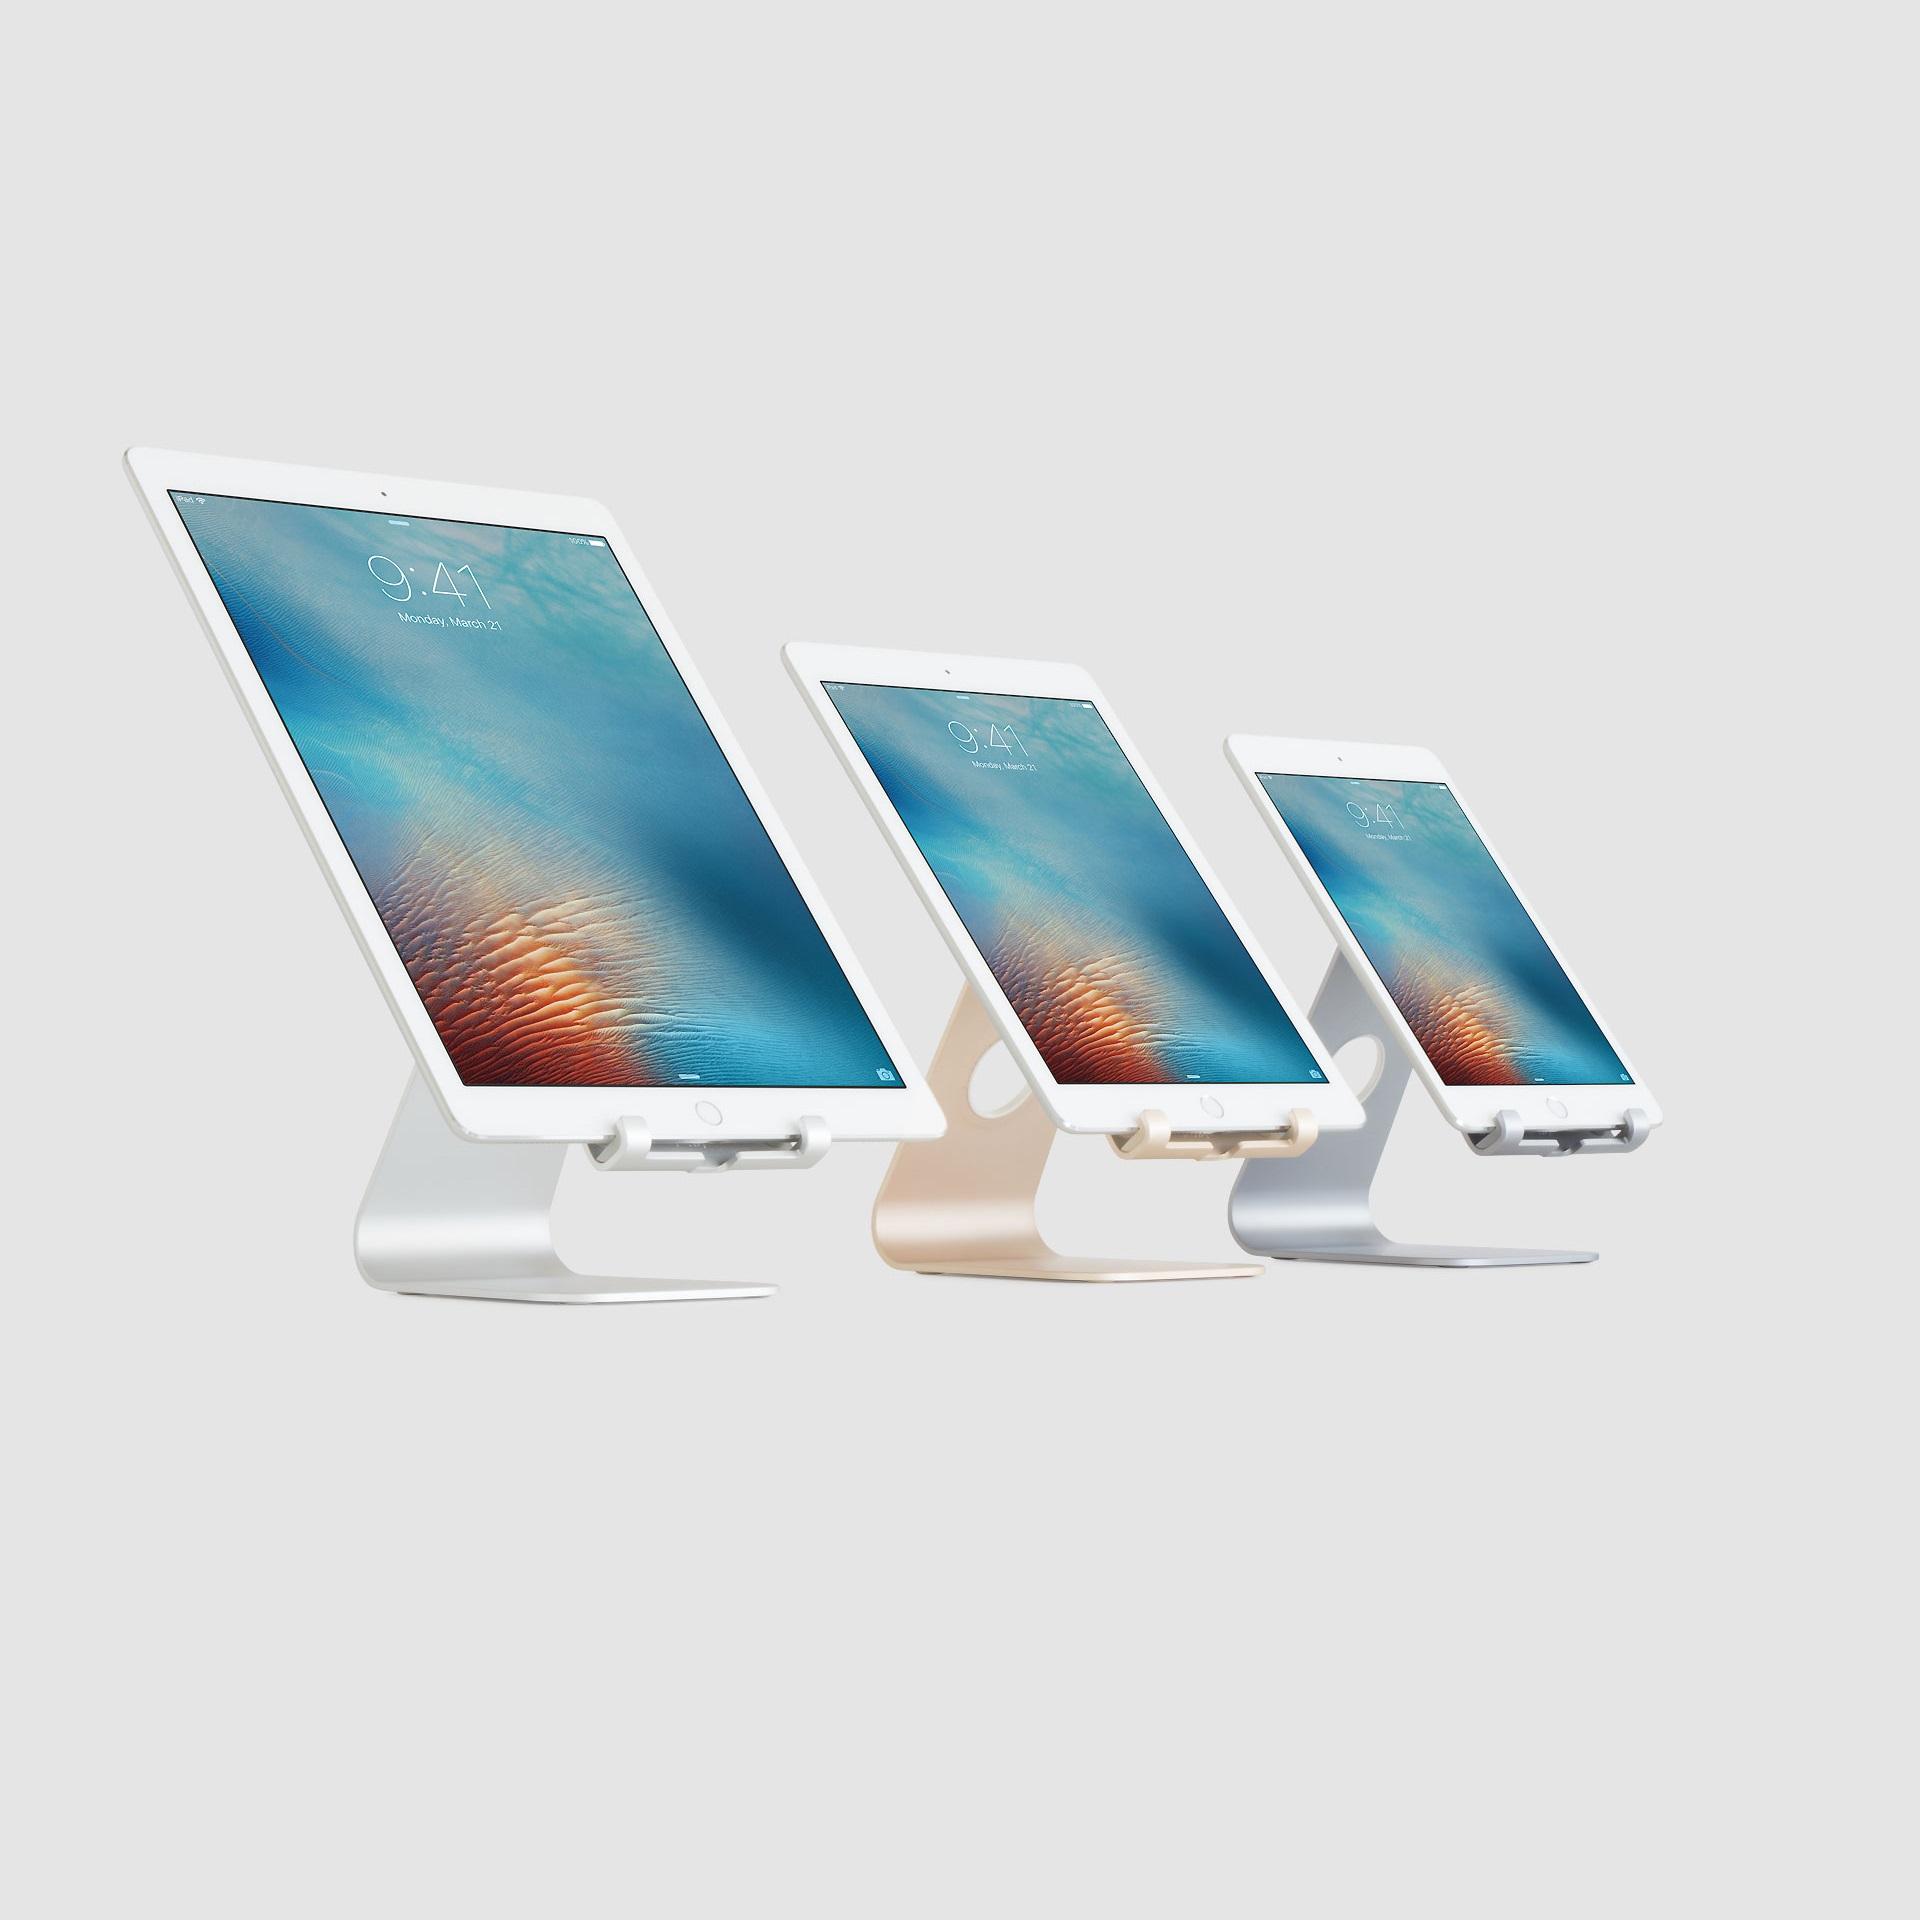 Suport Rain Design mStand Tablet Stand, Gold, pentru Apple iPad